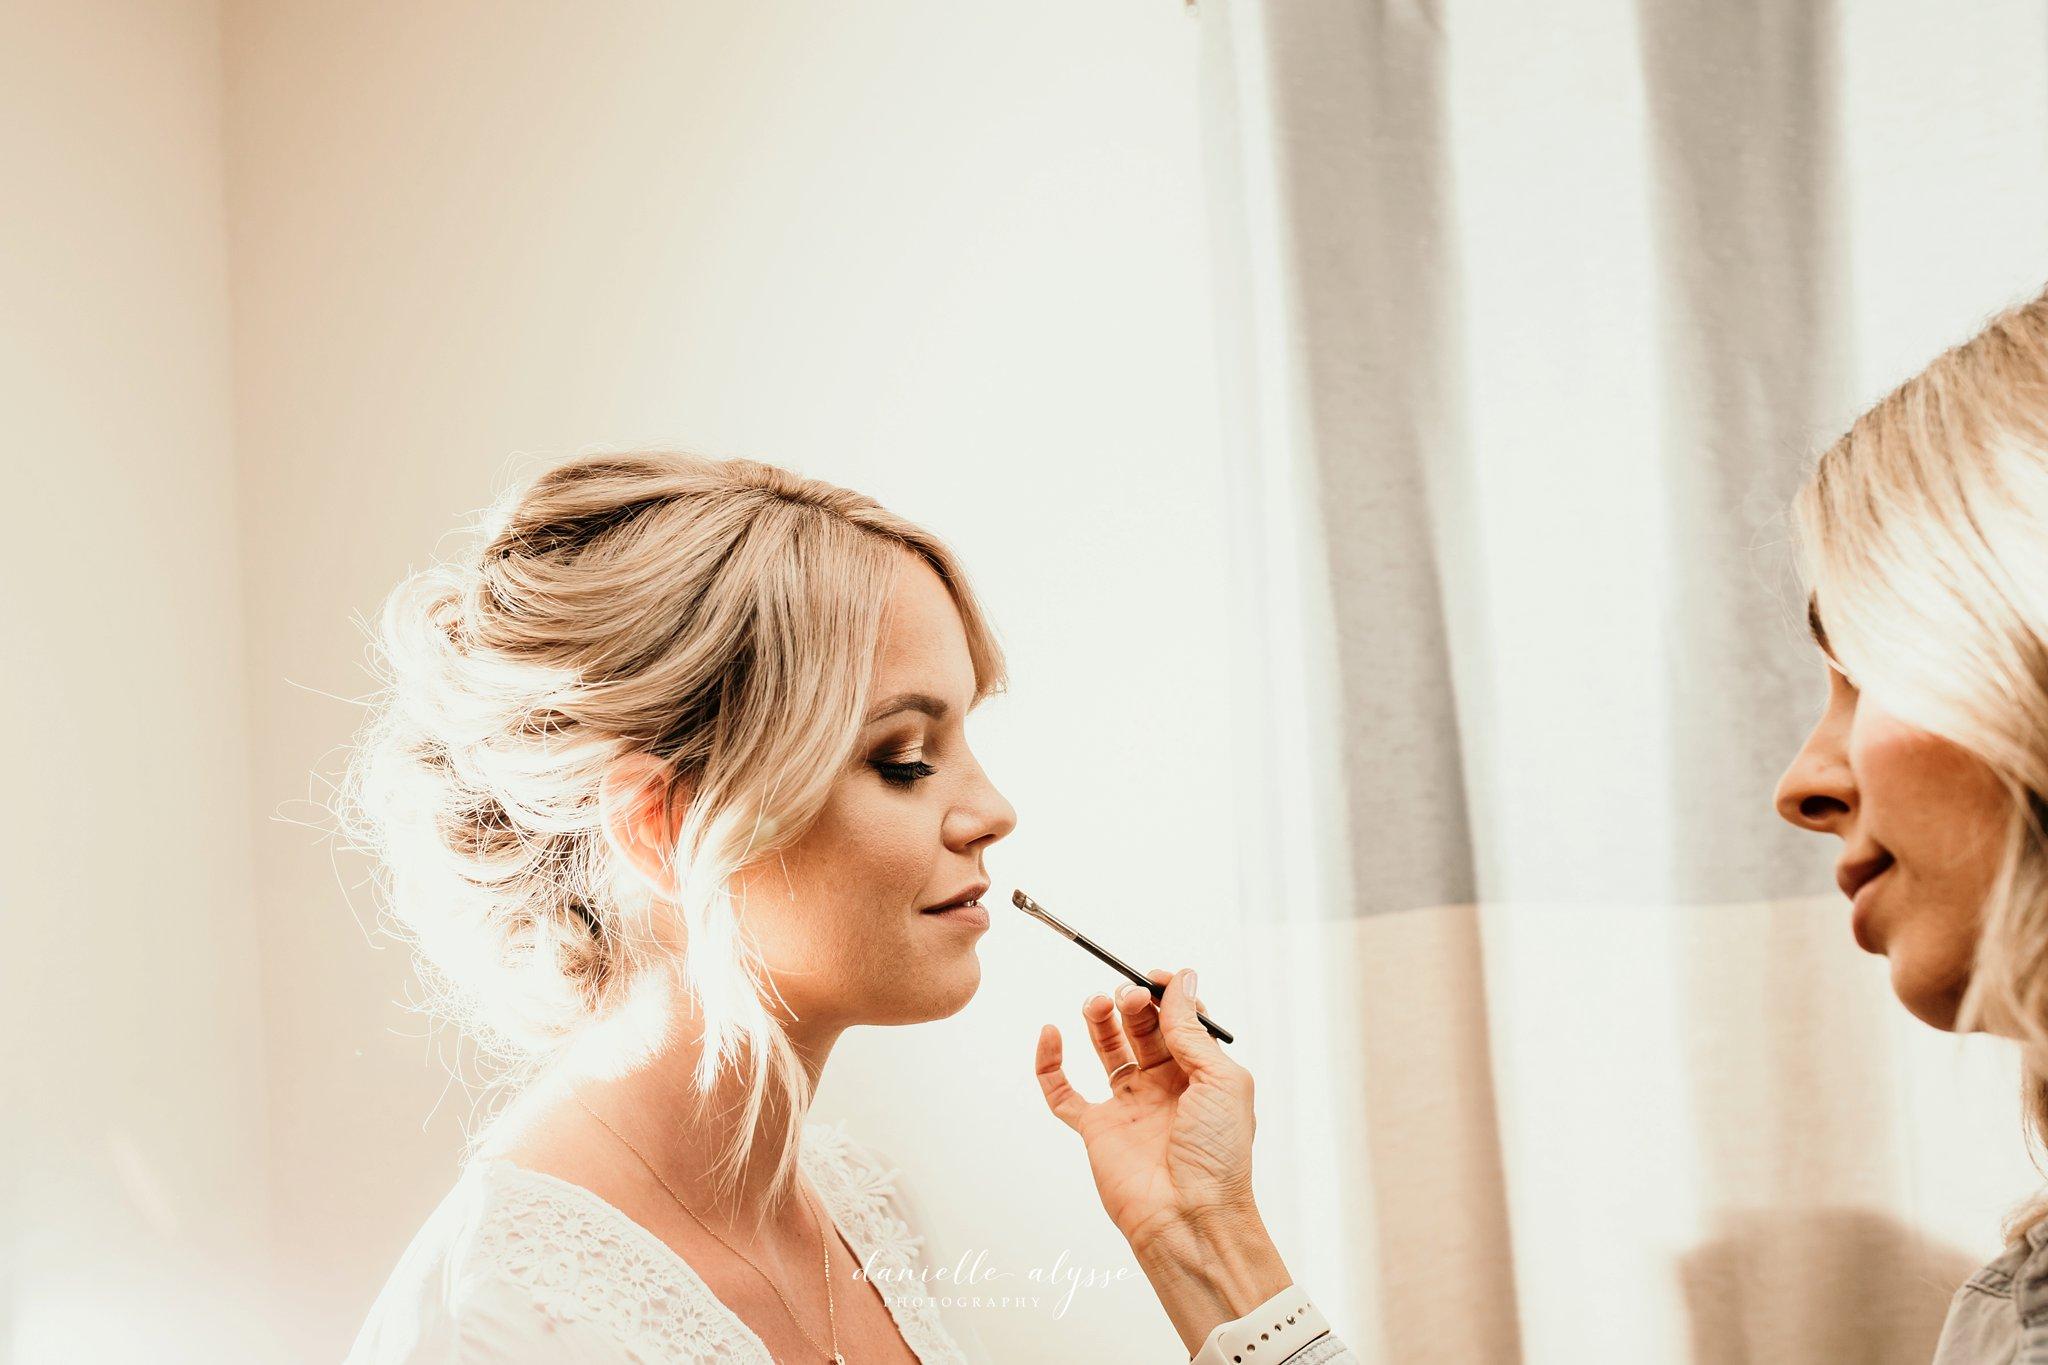 180831_wedding_stephanie_heavenly_south_lake_tahoe_danielle_alysse_photography_destination_blog_24_WEB.jpg